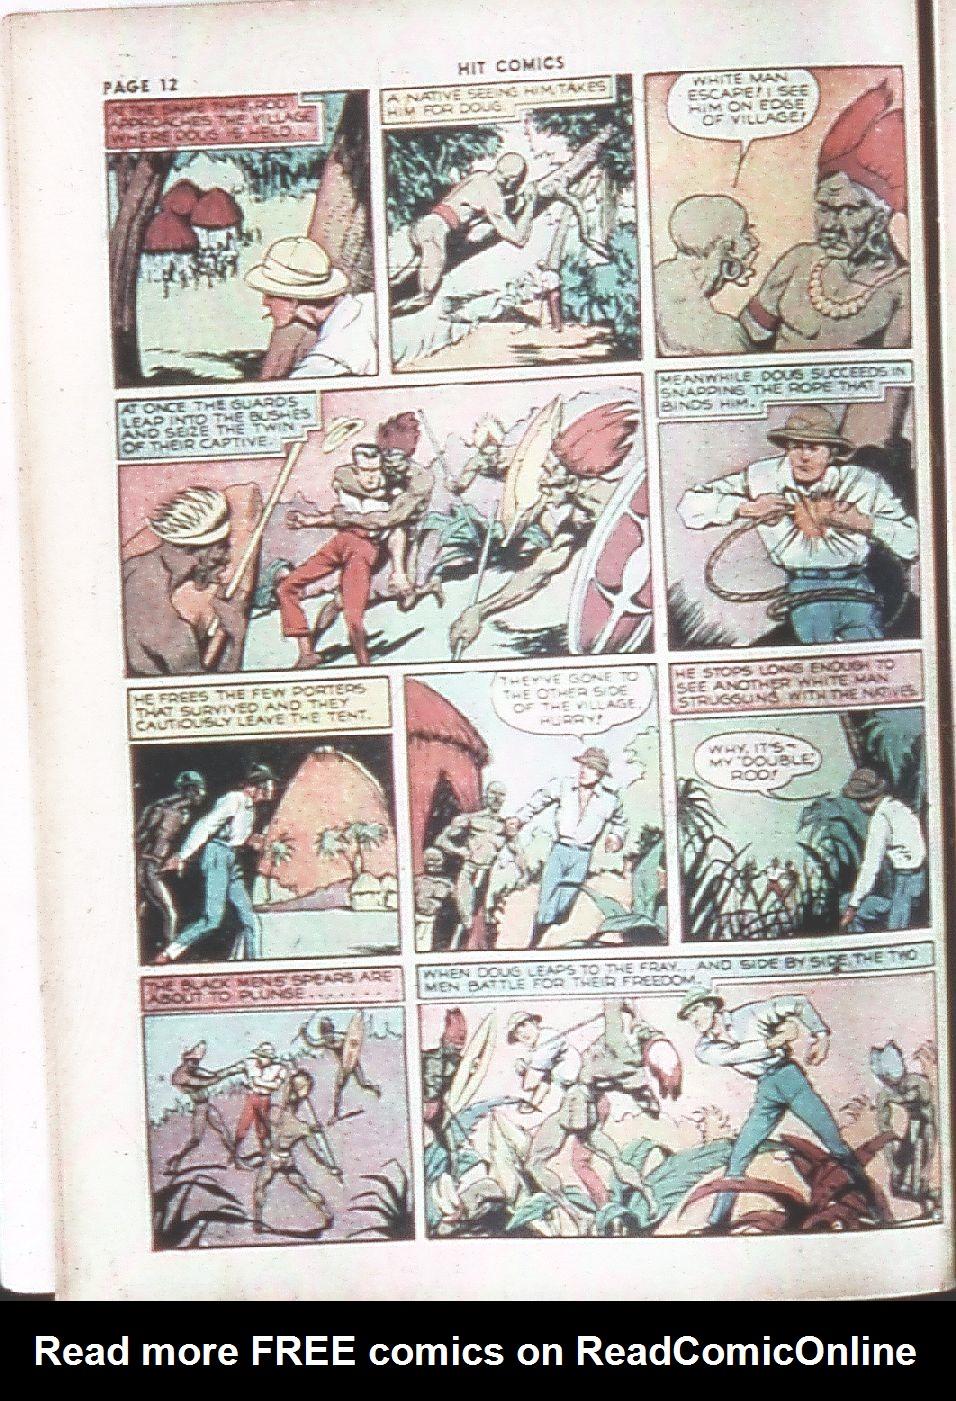 Read online Hit Comics comic -  Issue #7 - 14